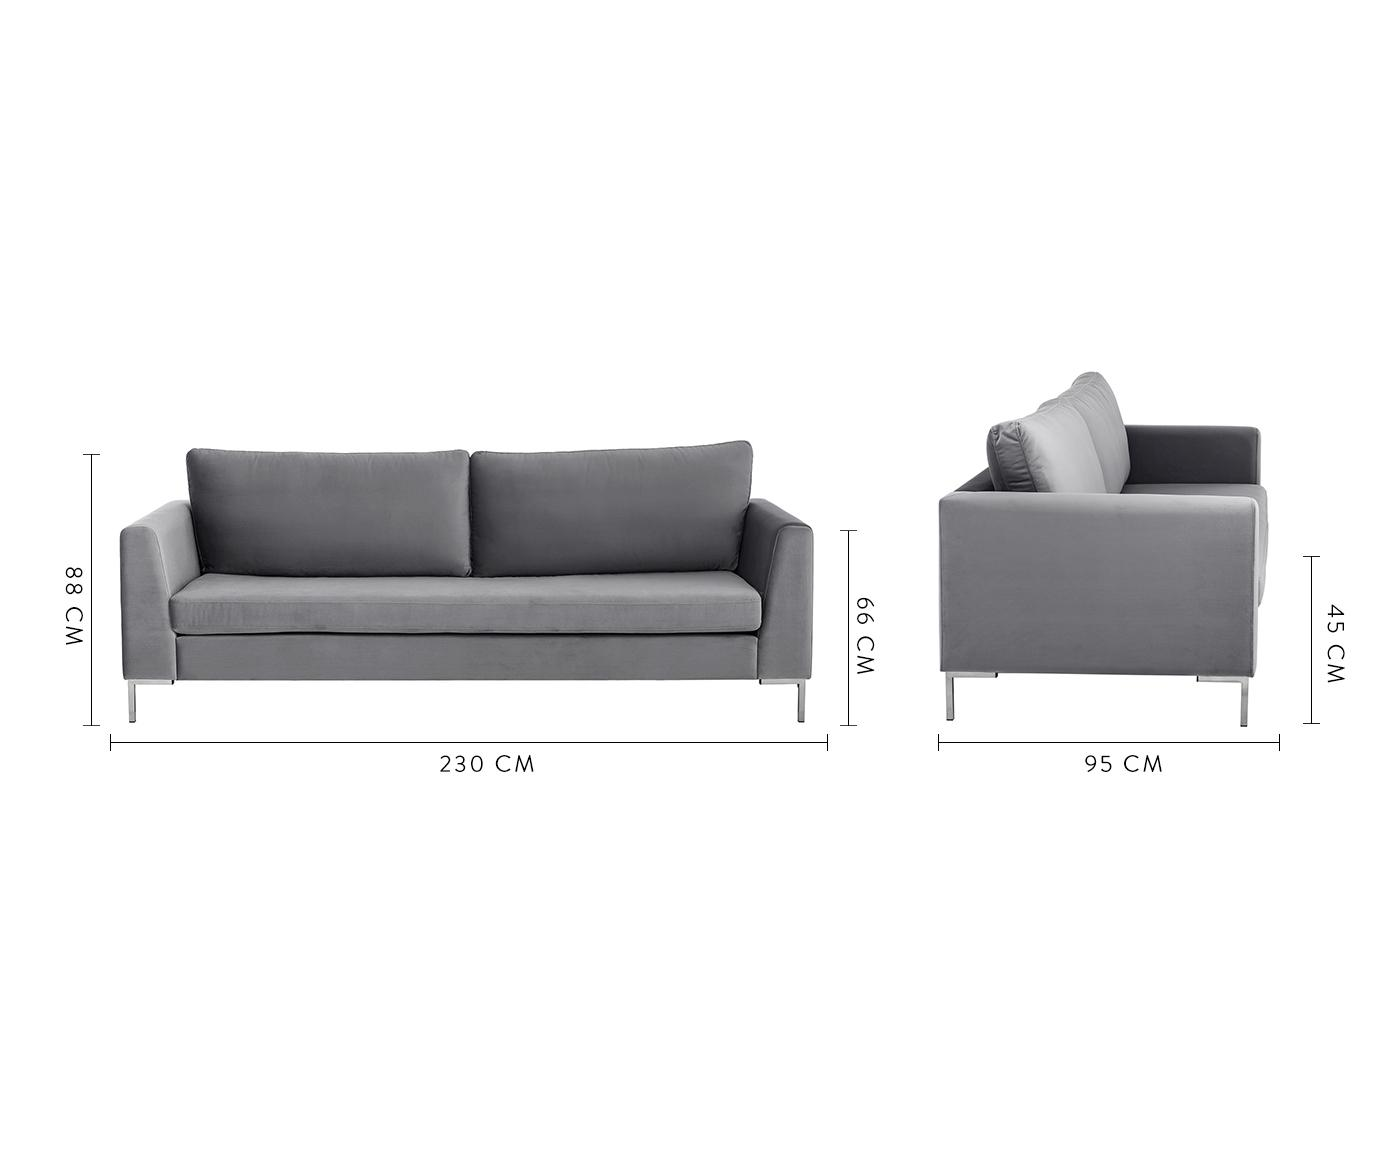 Samt-Sofa Luna (3-Sitzer), Bezug: Samt (Polyester) 80.000 S, Gestell: Massives Buchenholz, Füße: Metall, galvanisiert, Samt Dunkelgrau, Silber, B 230 x T 95 cm